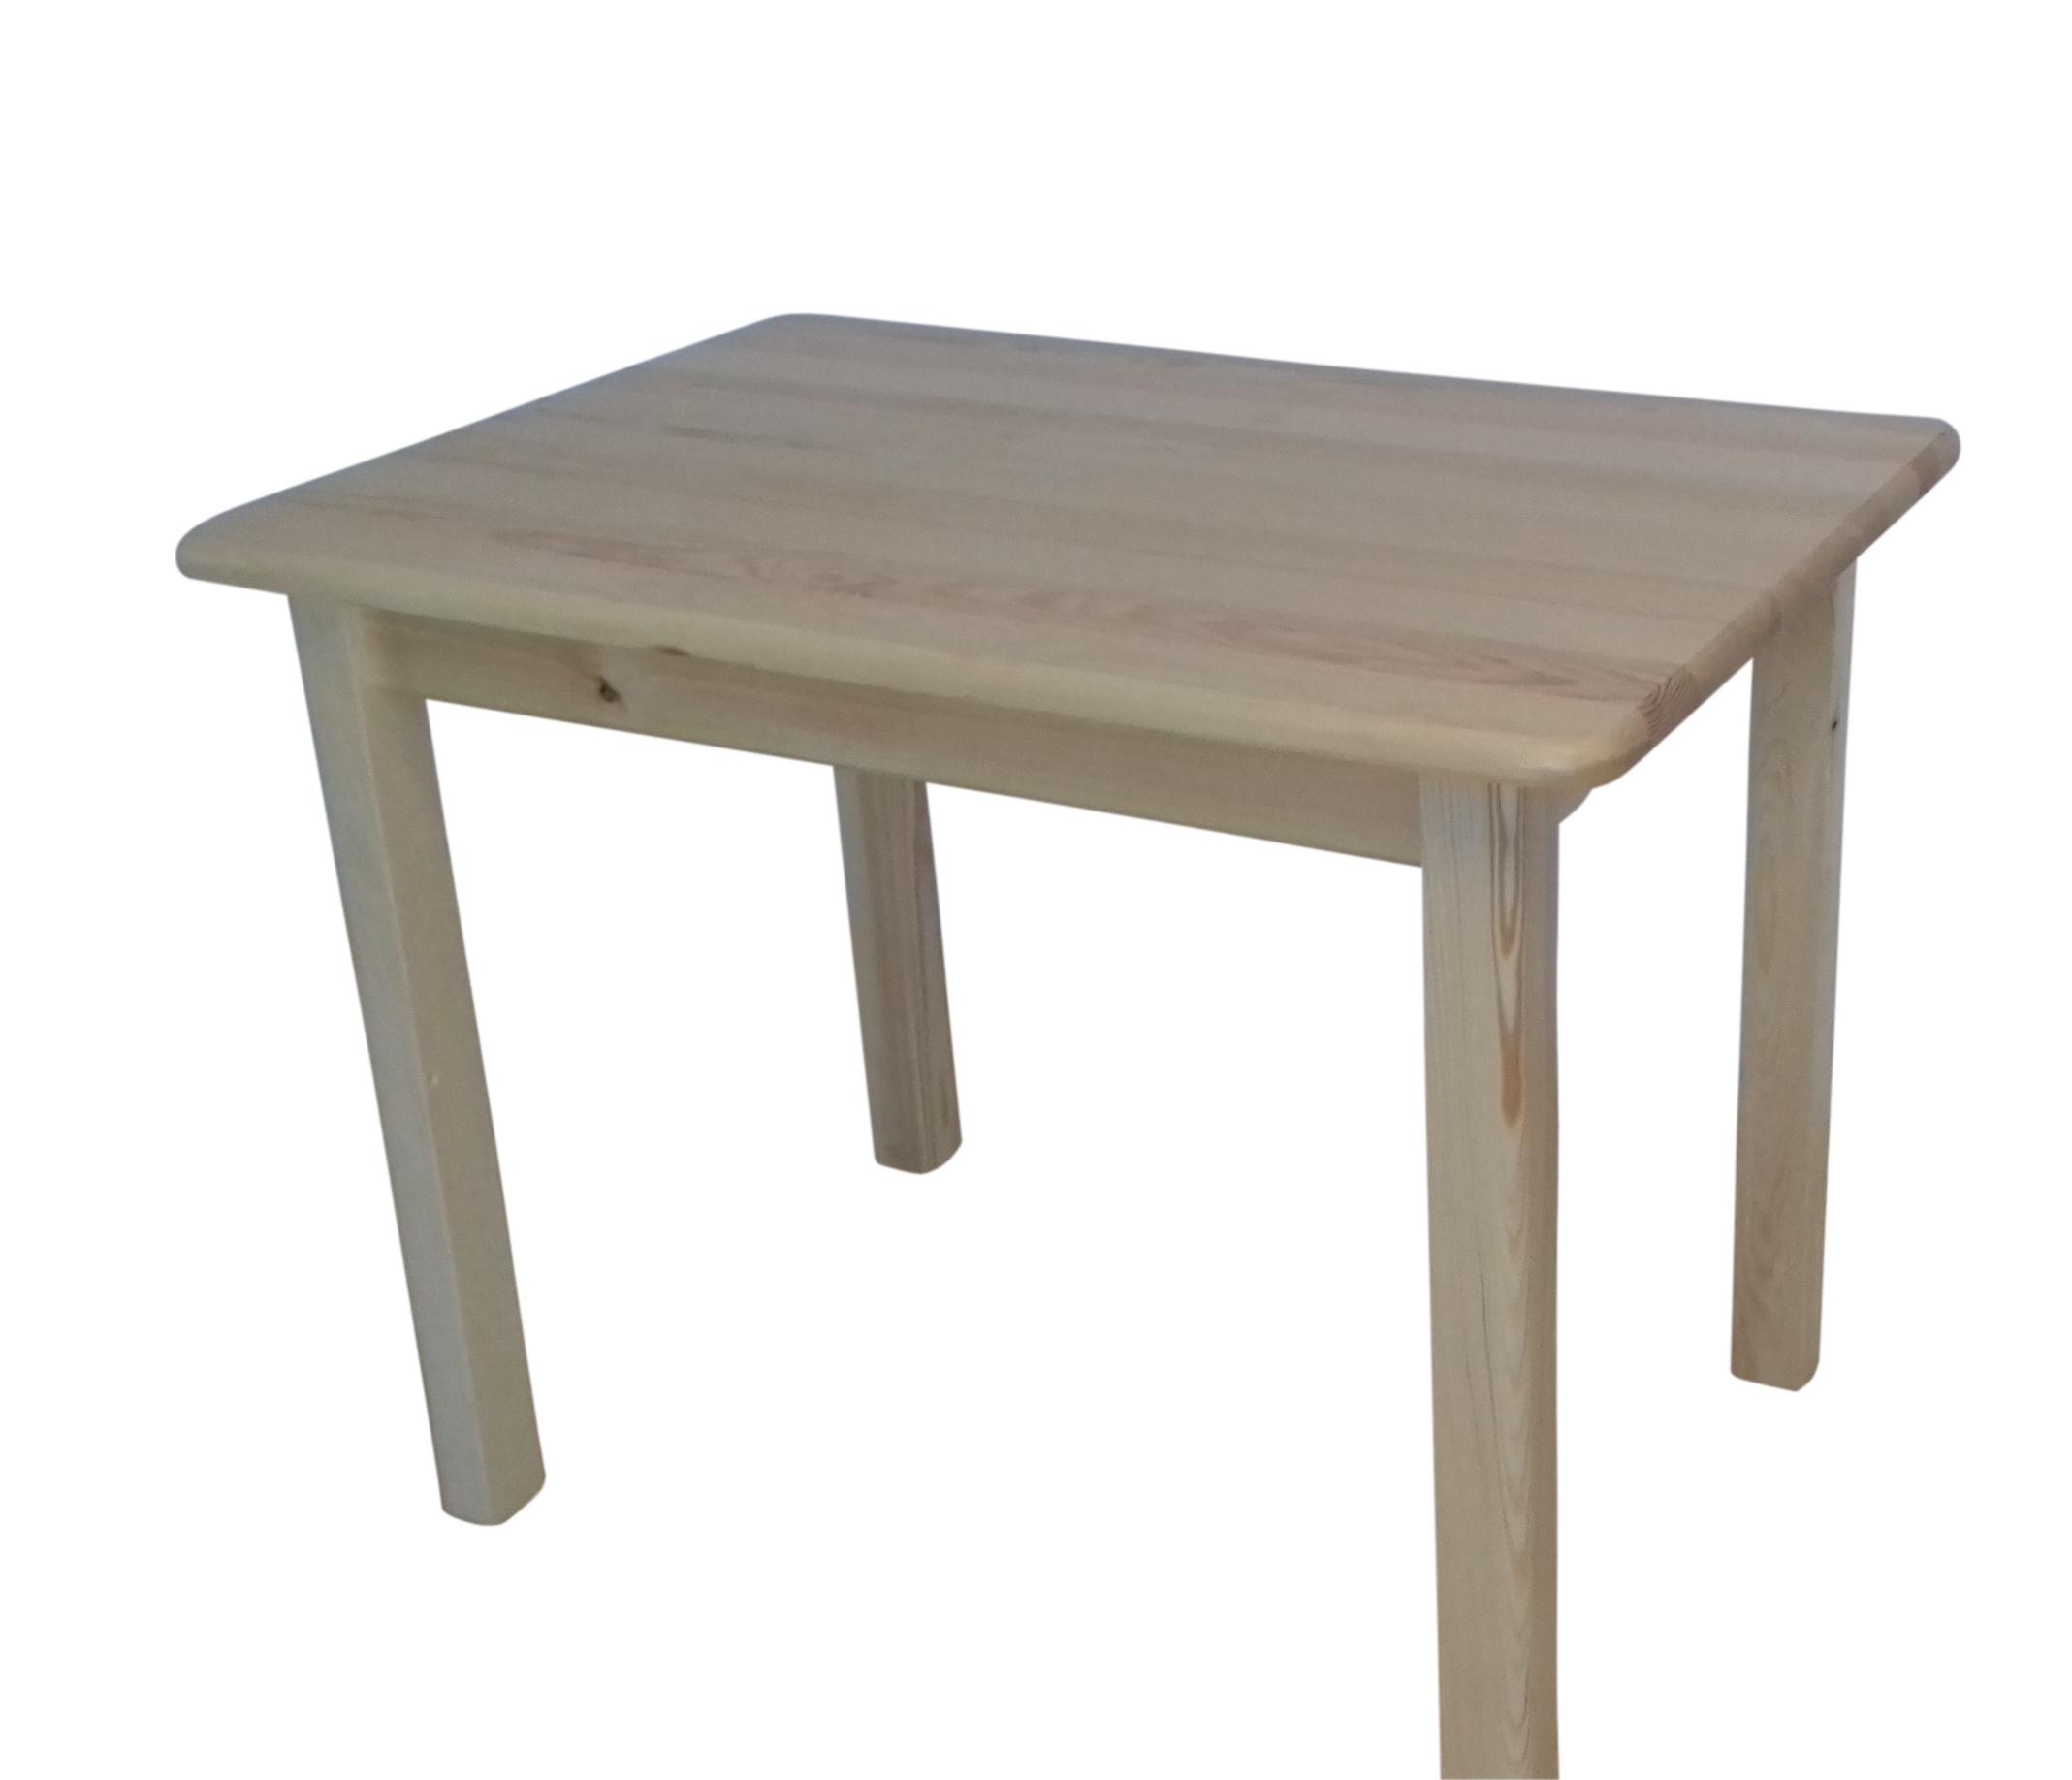 MASÍVNE kuchynský stôl 120x80 kuchyňa, jedáleň, bar